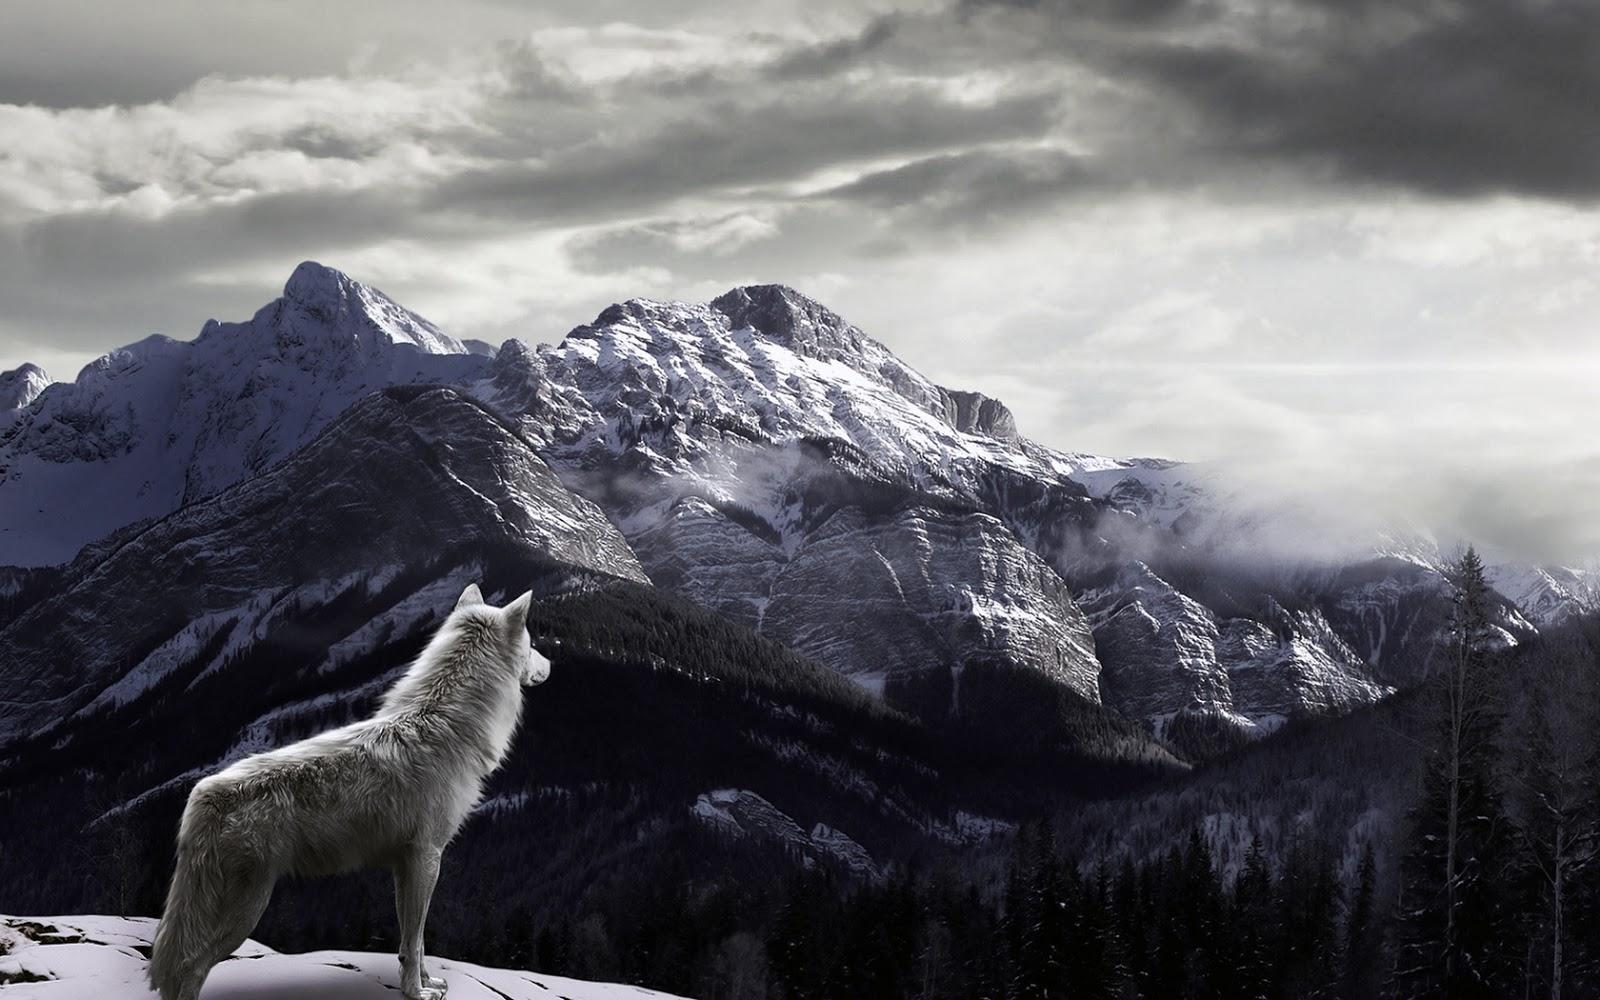 Popular Wallpaper Mountain Fog - Wolf-Watching-Snowy-Fog-Covered-Mountains-HD-Wallpaper  2018_45895.jpg